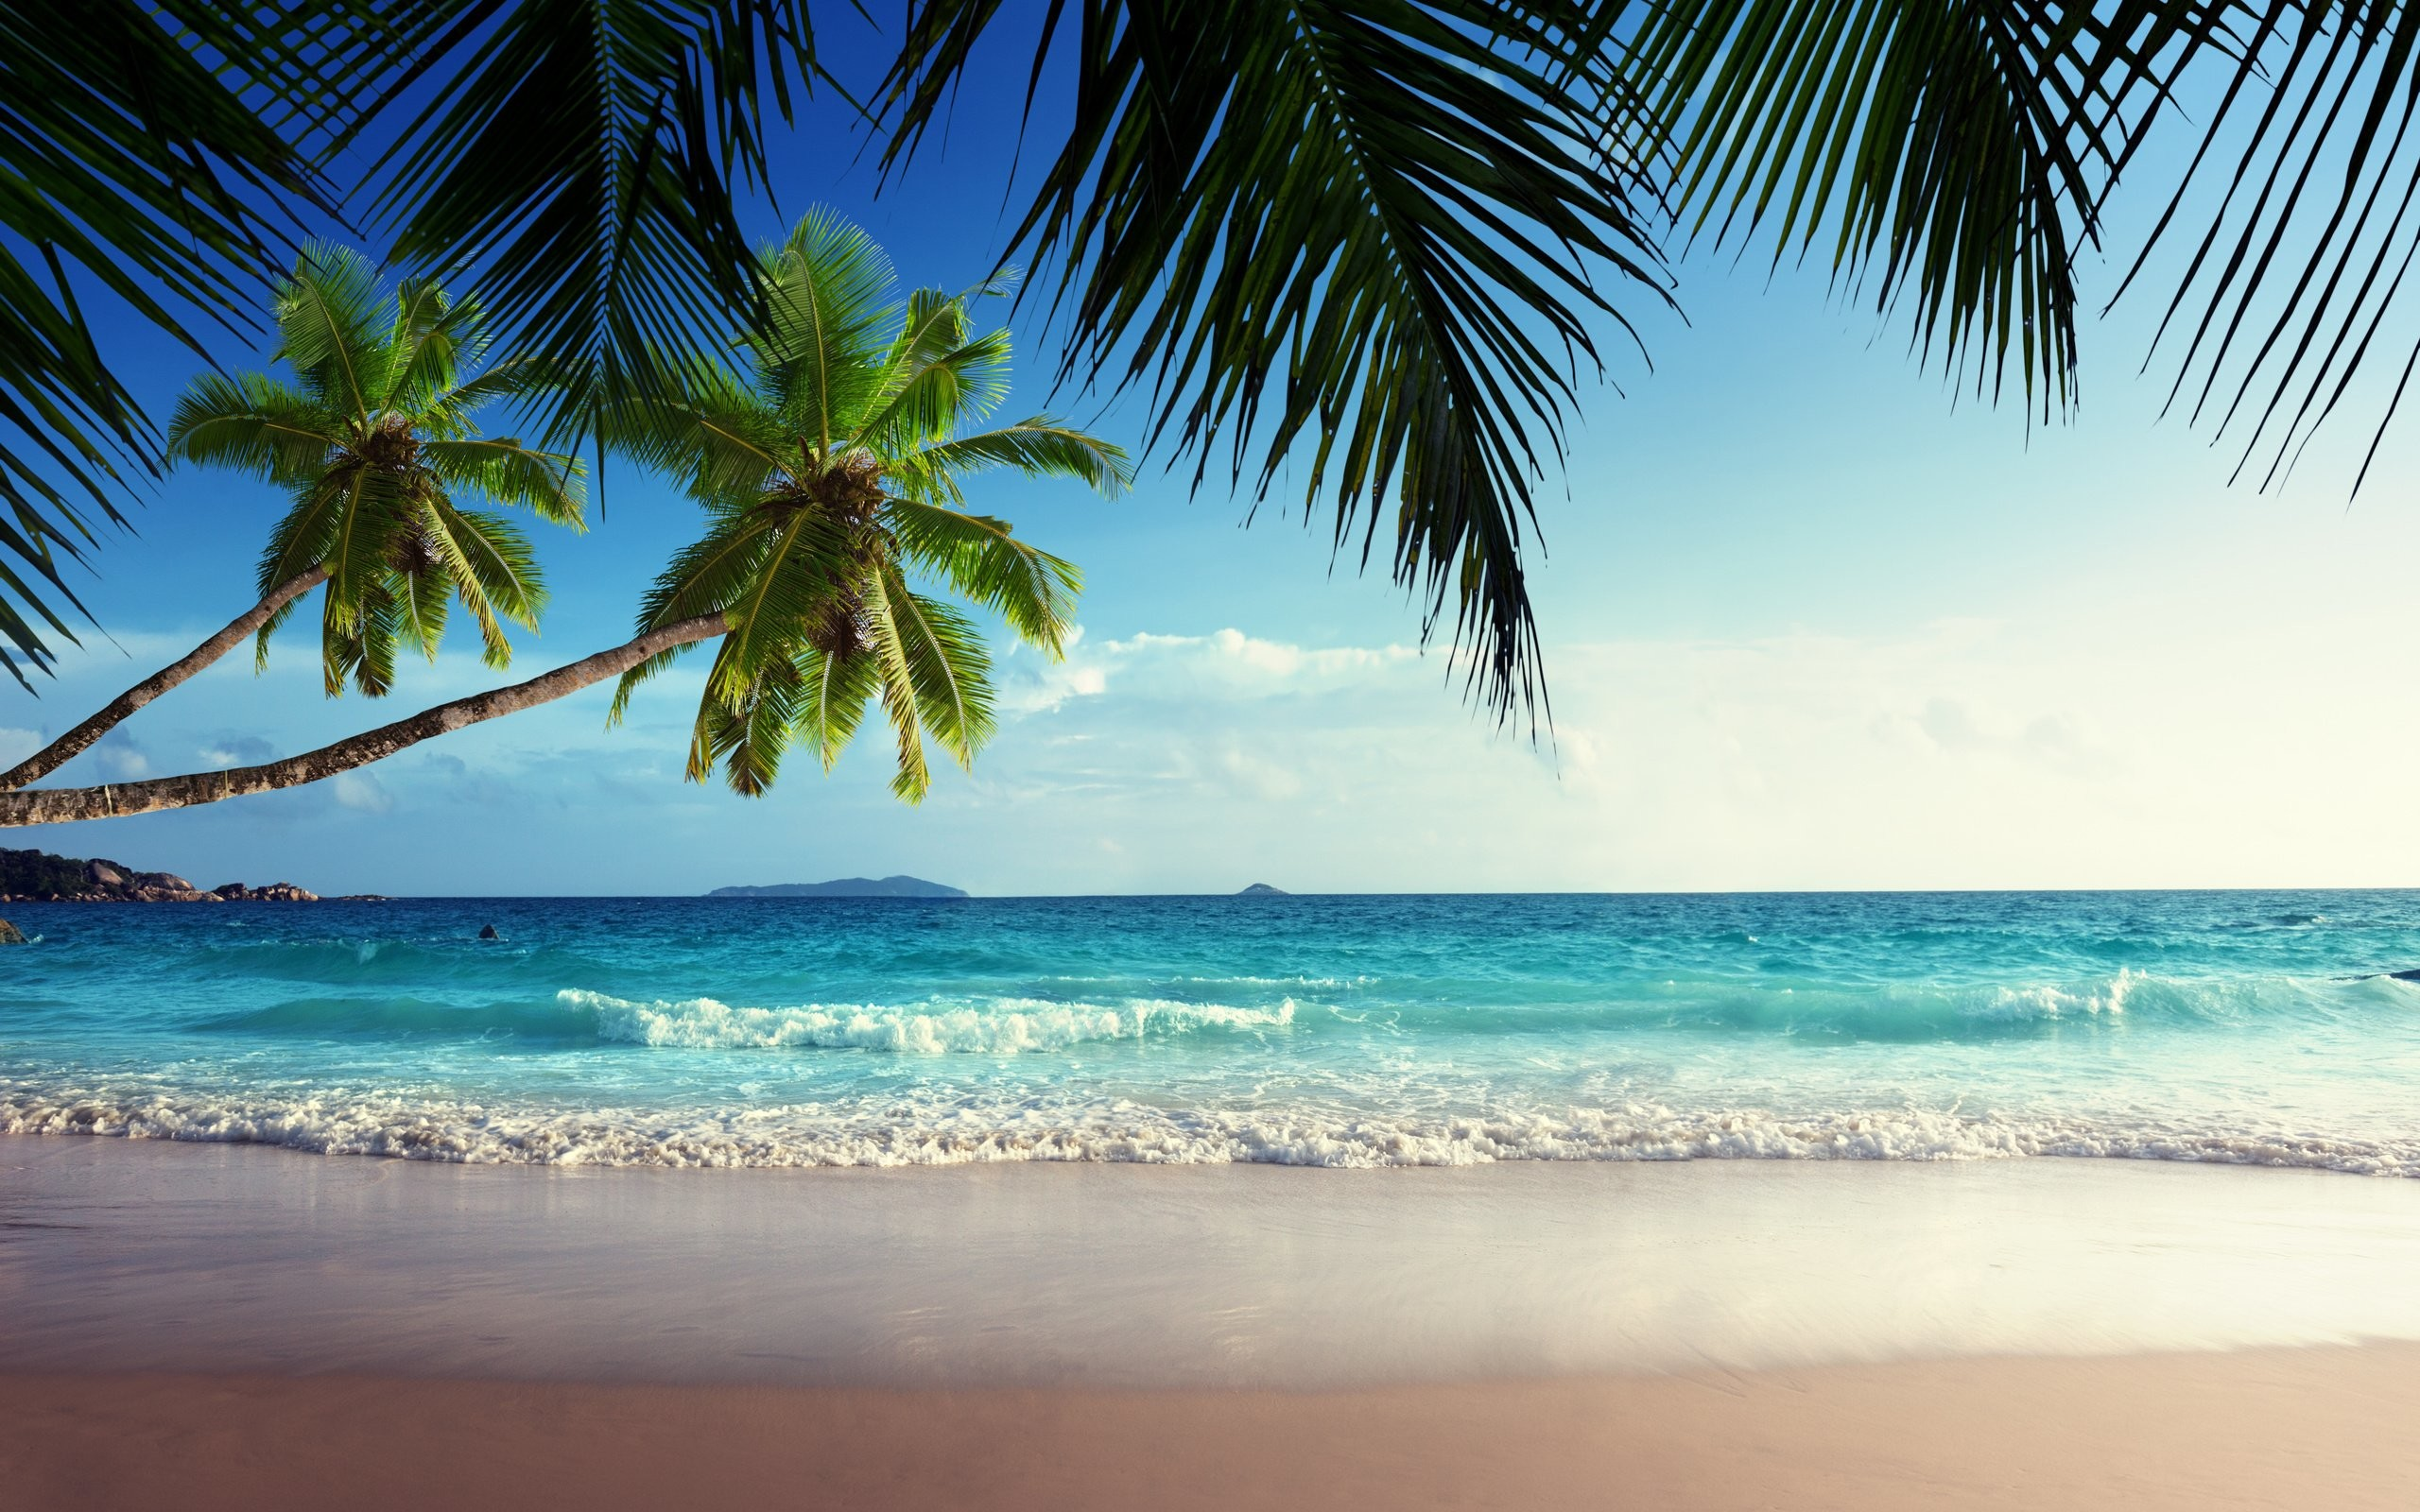 Paradise beach wallpaper - Beach Wallpapers